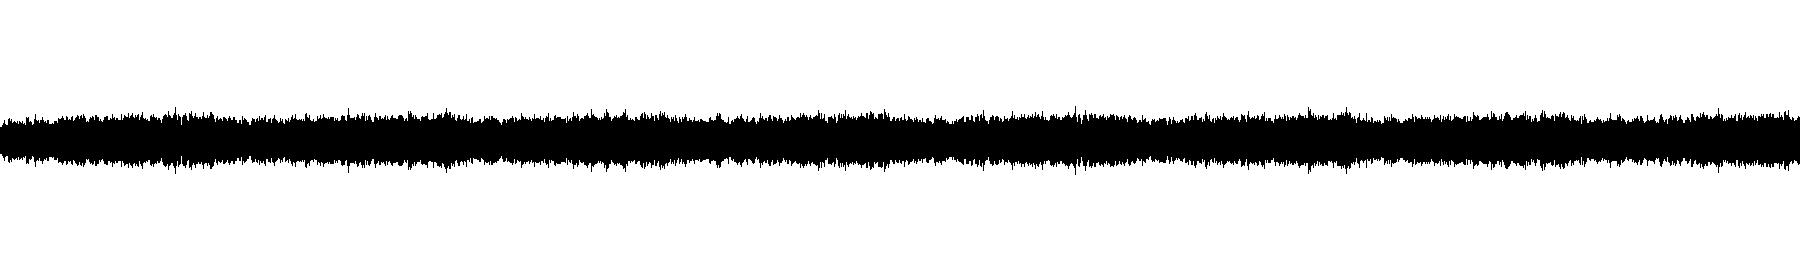 vedh melodyloop 103 f c dm b 120bpm